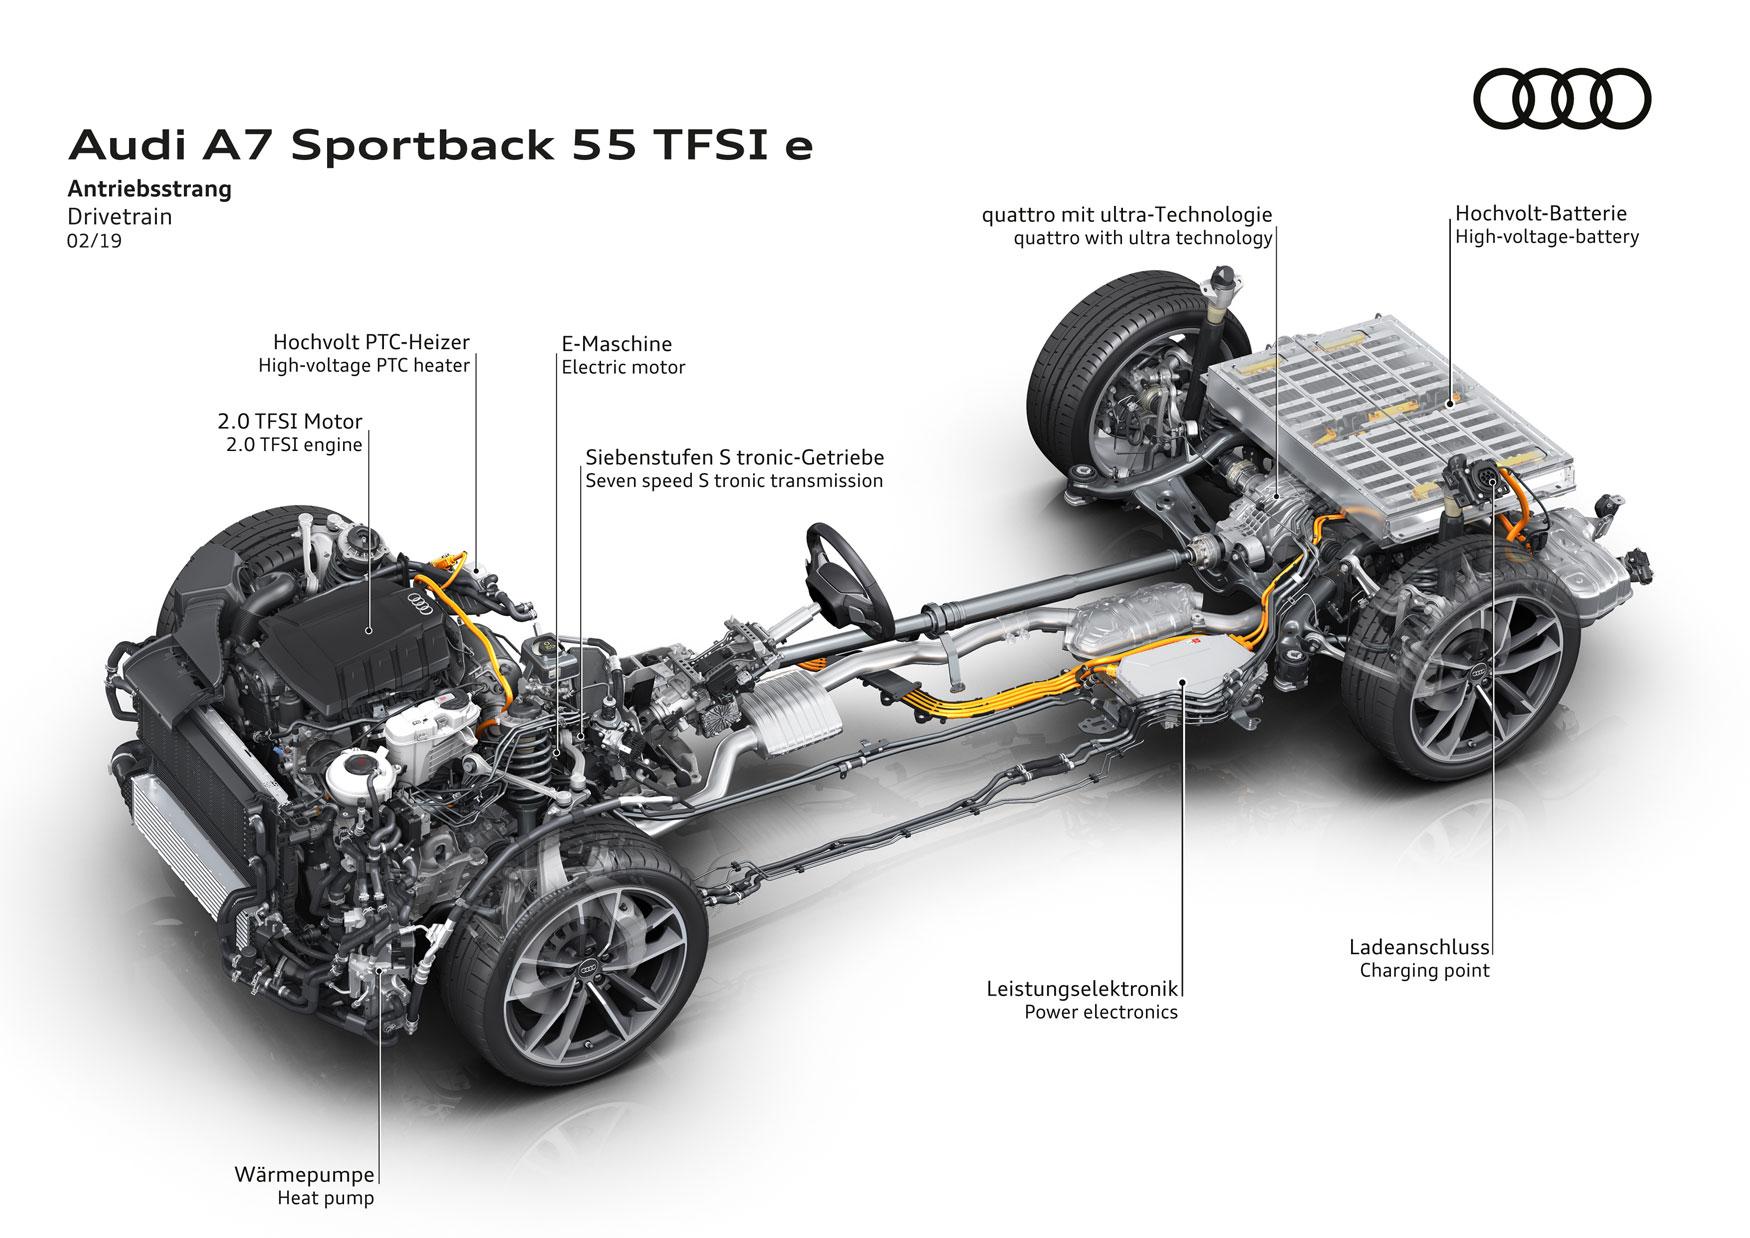 Audi-A7-Sportback-55-TFSI-Plug-in-Hybrid-Technik